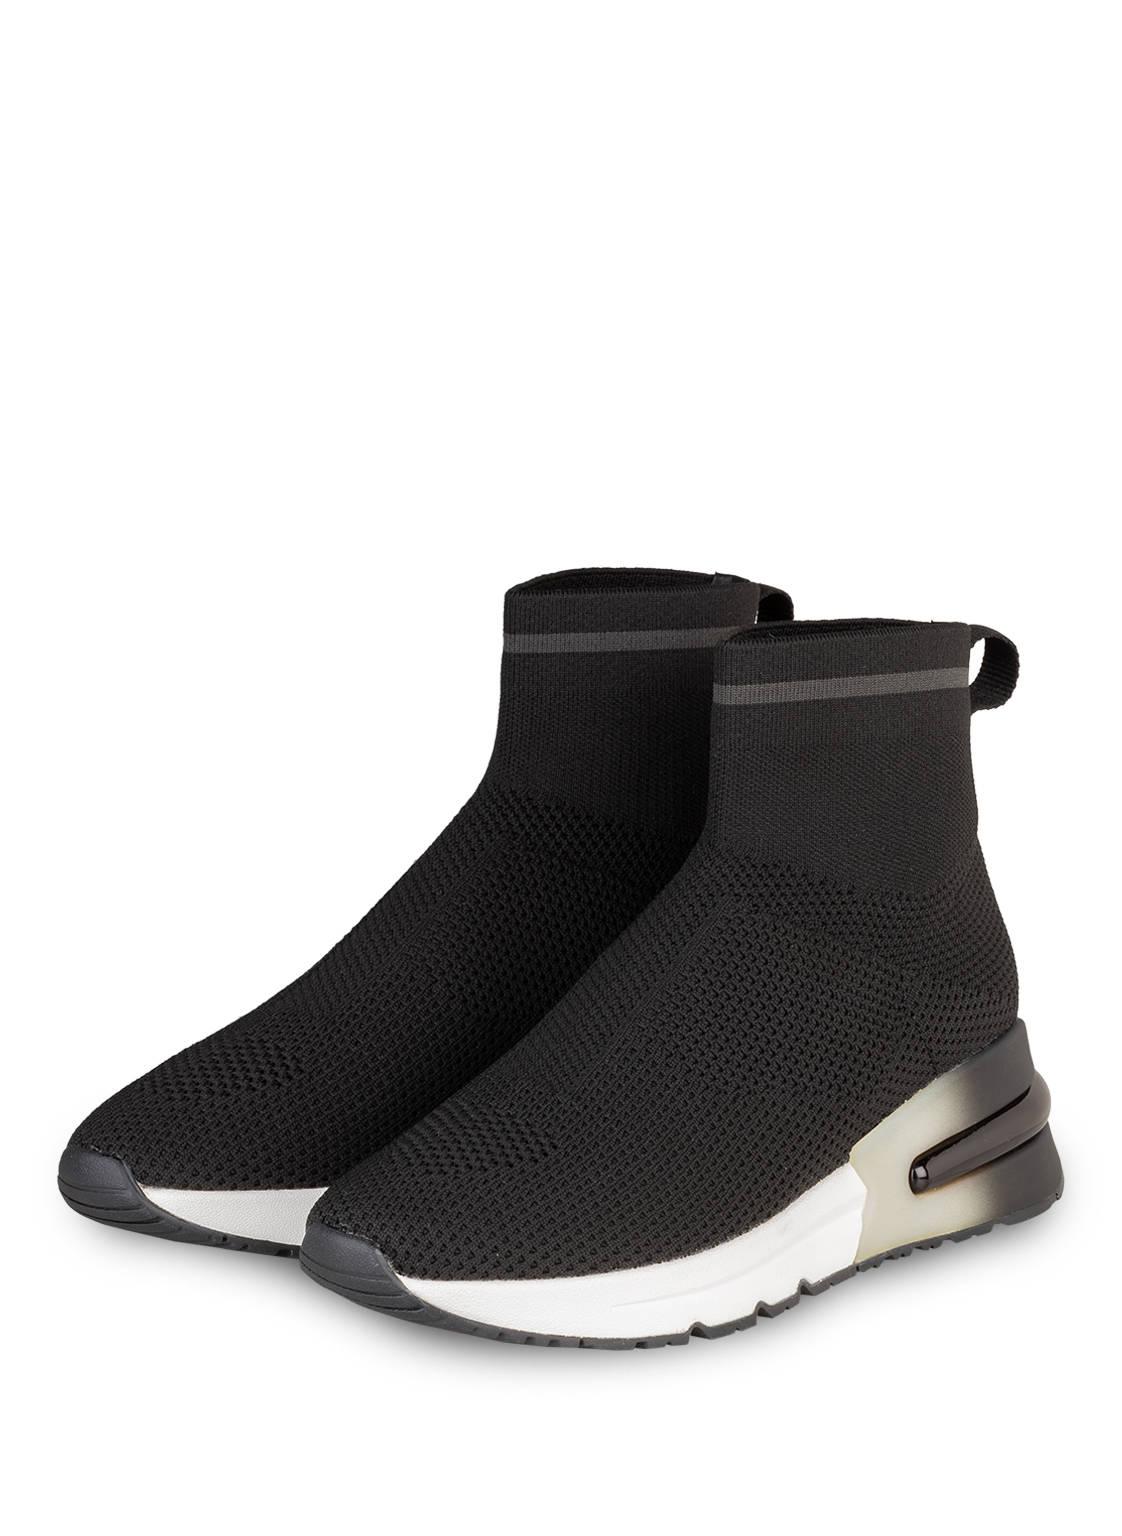 Image of Ash Hightop-Sneaker Kyle schwarz